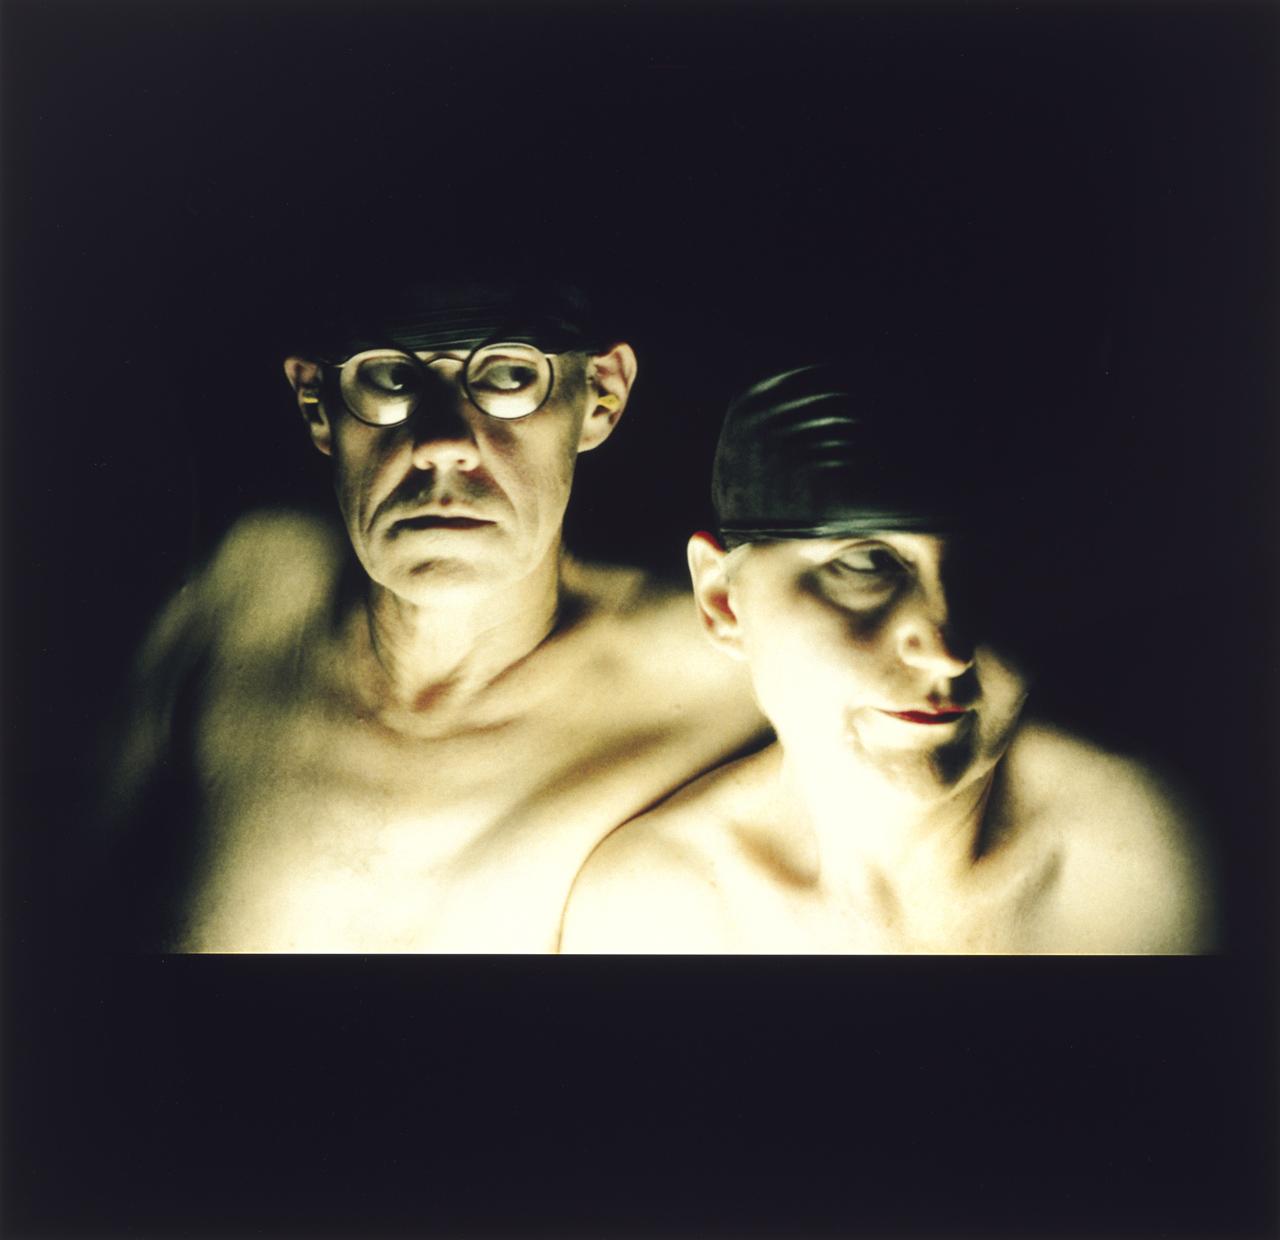 Farrell Parkin - Self Portrait No 1_2003 - ARC ONE LR.jpg